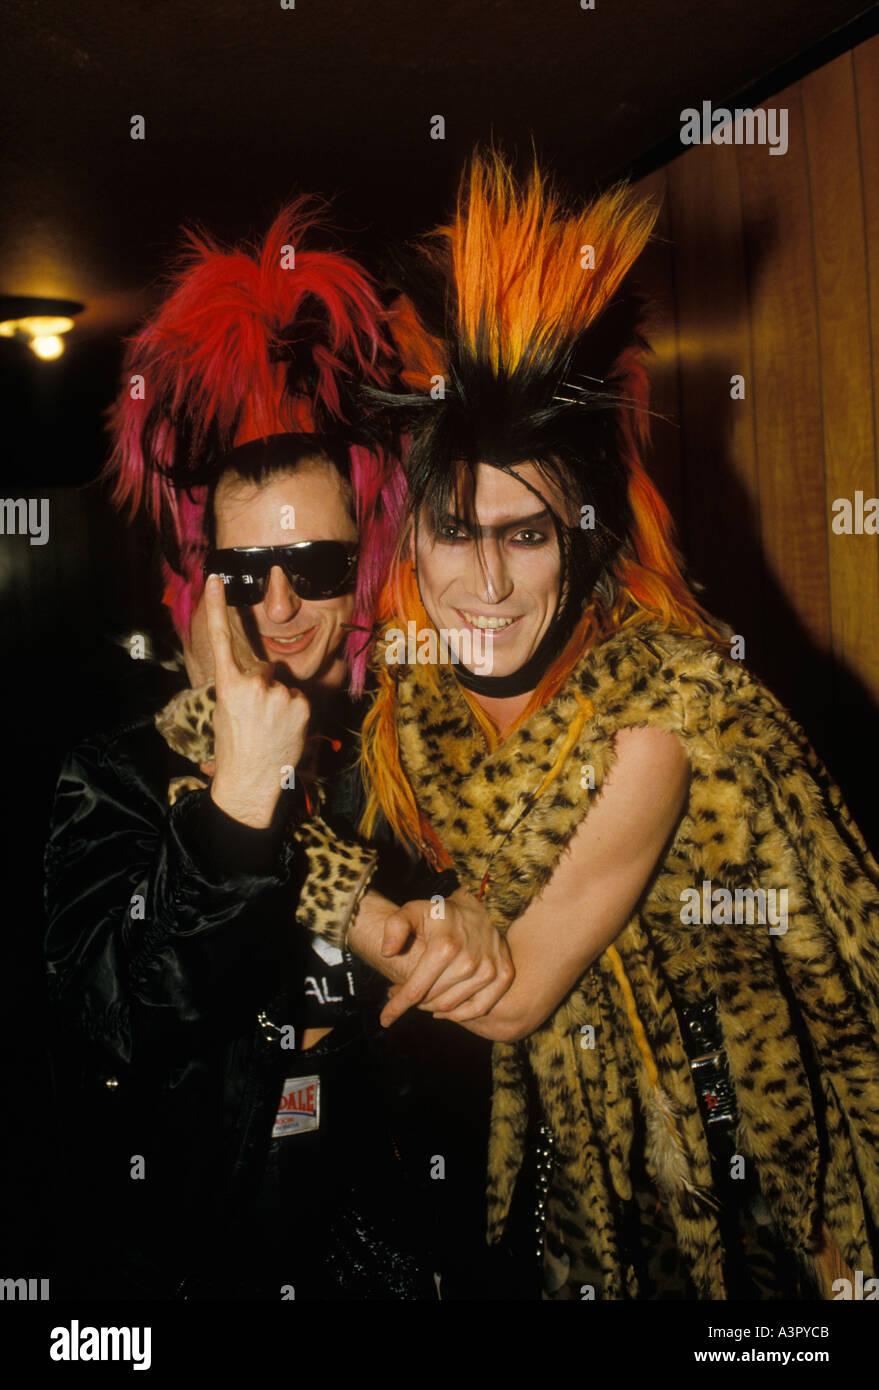 Tony James musician lead singer with punk rock band 'Sigue Sigue Sputnik' 'Martin Degville' HOMER SYKES - Stock Image